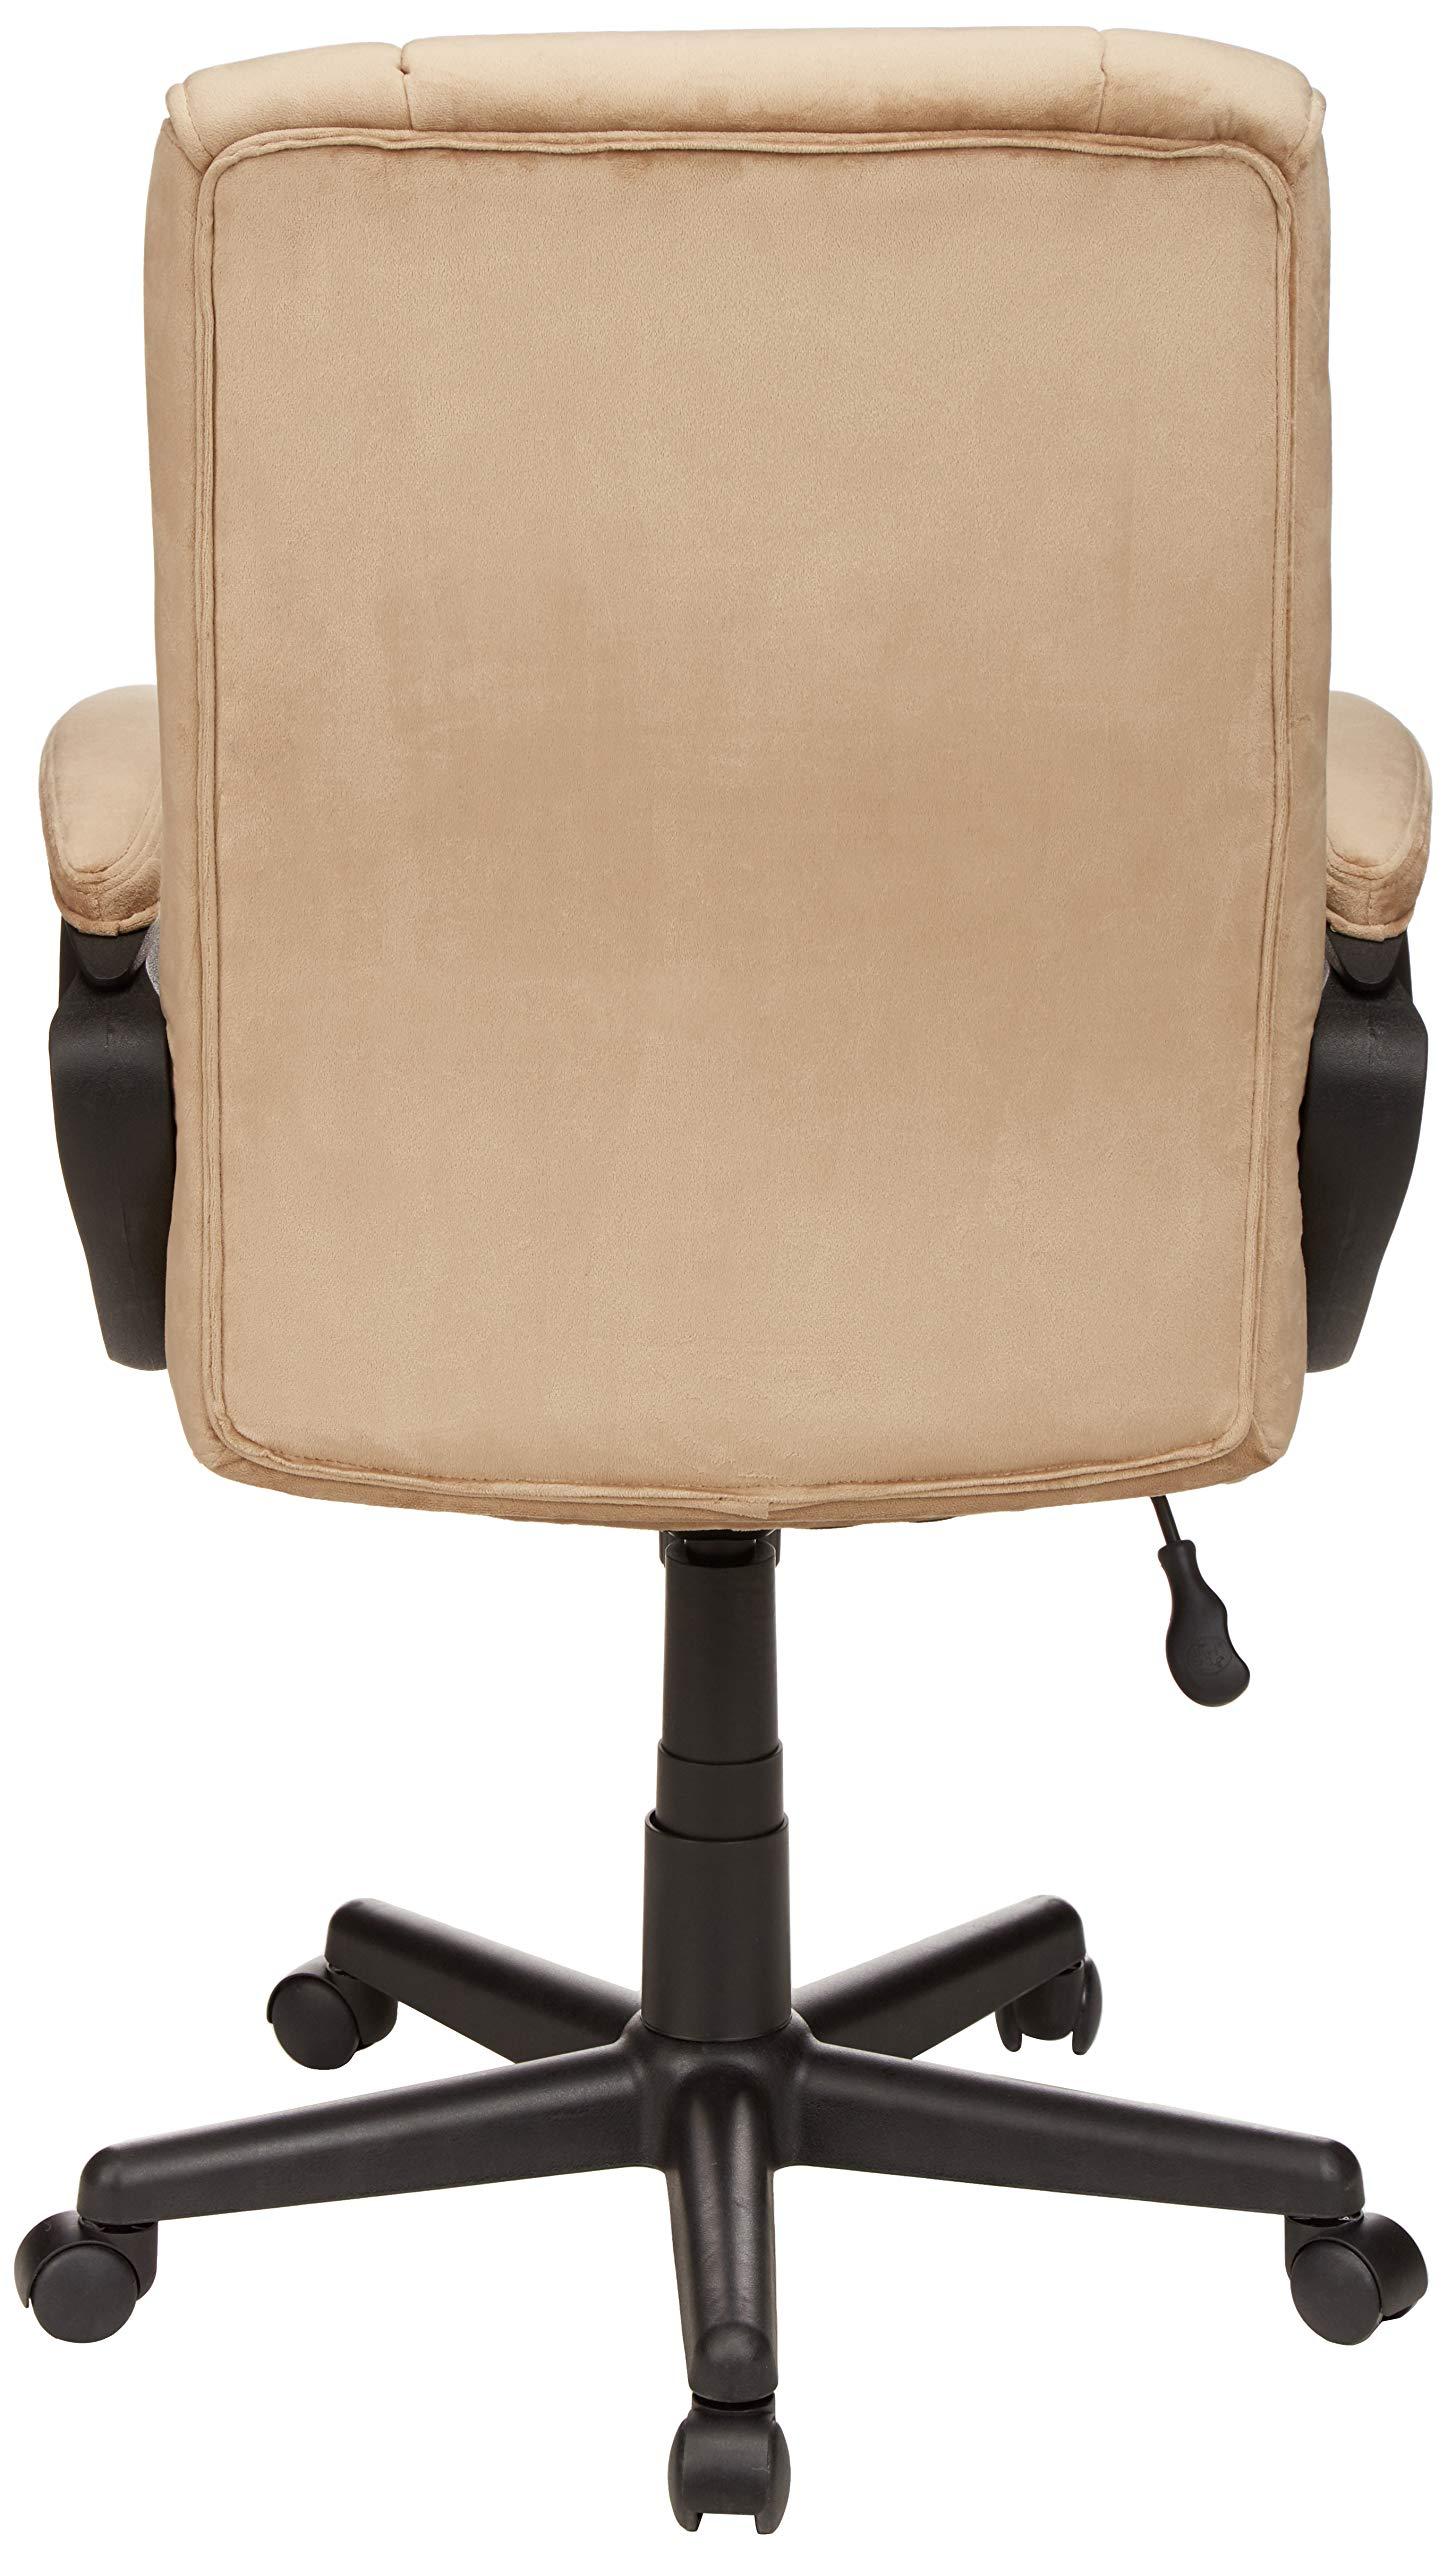 AmazonBasics Classic Office Chair - Adjustable, Swiveling, Microfiber Cover - Light Beige by AmazonBasics (Image #5)